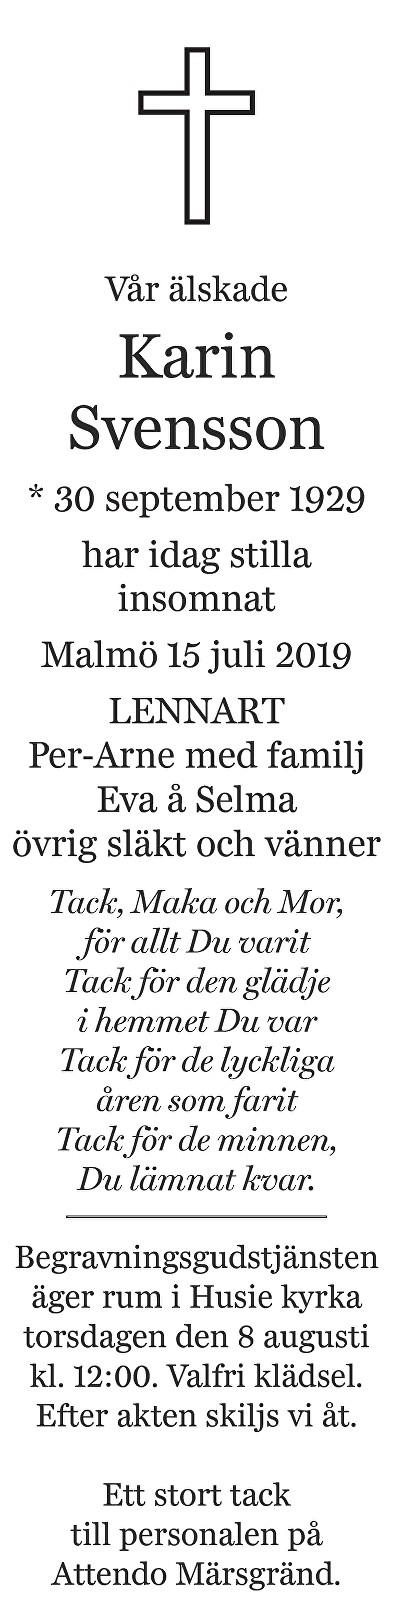 Karin Svensson Death notice